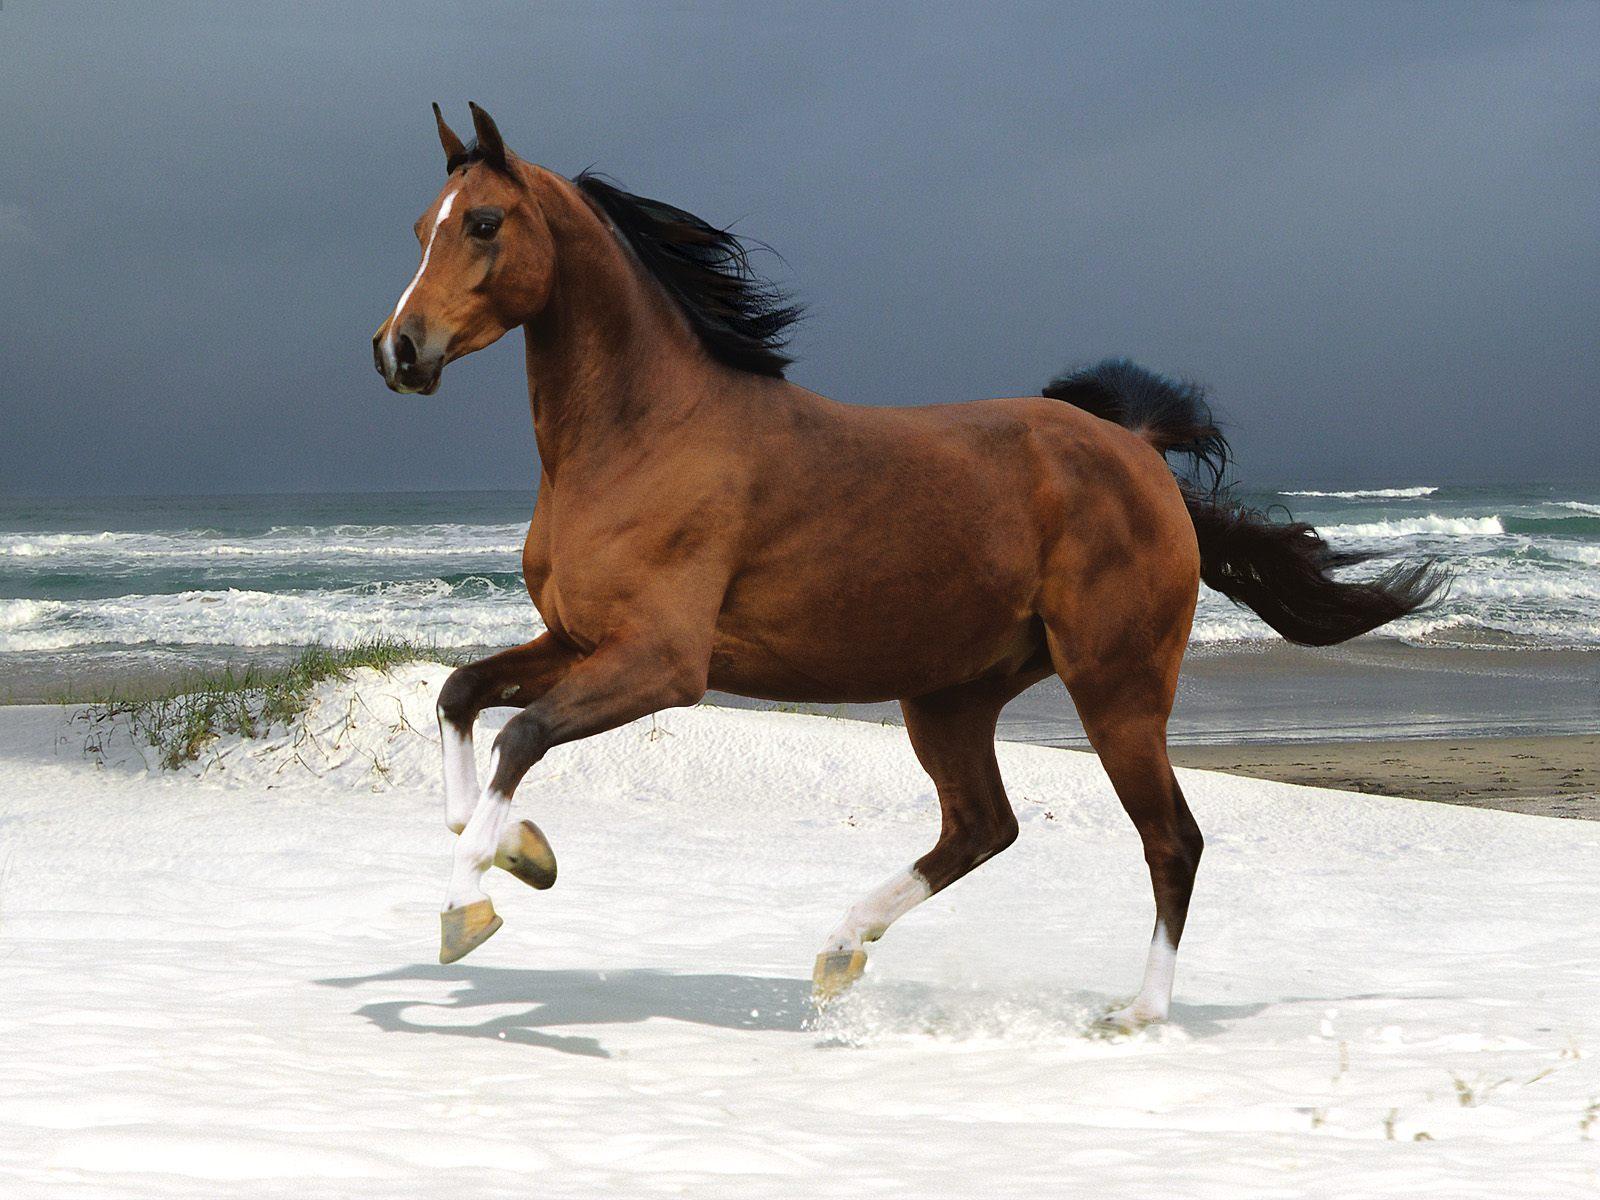 Wonderful   Wallpaper Horse Pinterest - The-best-top-desktop-horse-wallpapers-37  Best Photo Reference_132674.jpg